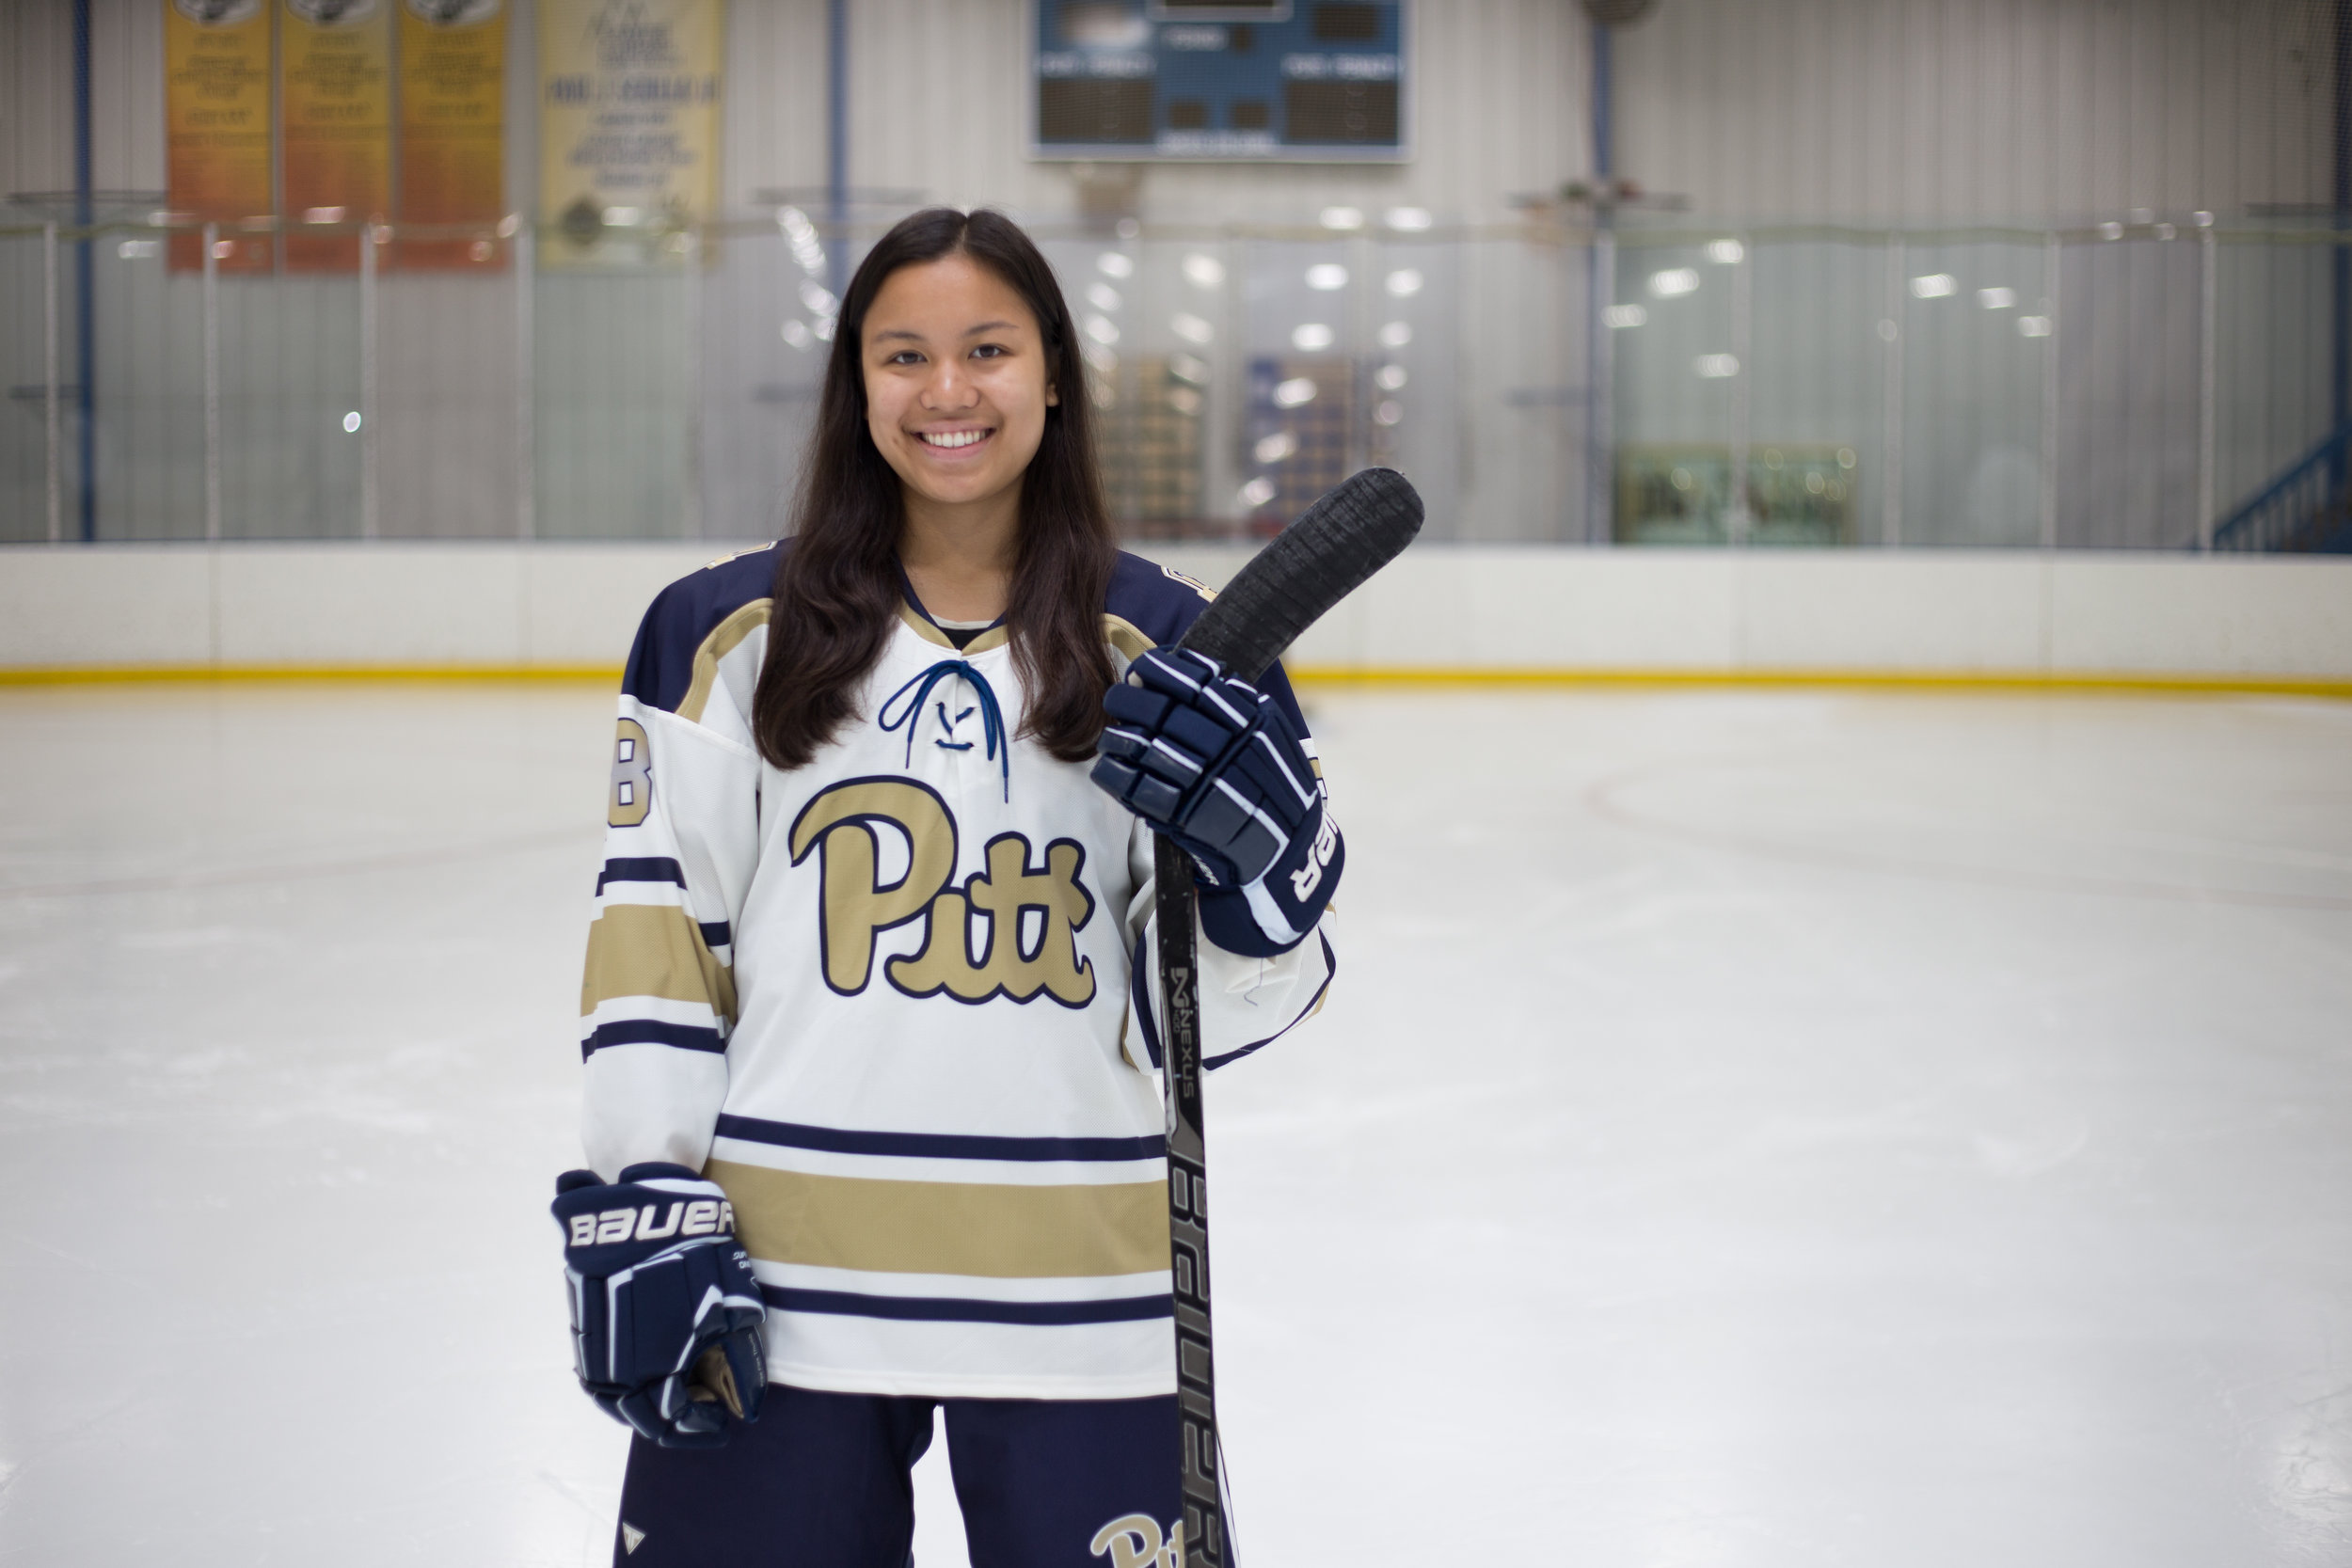 hockeyPortraits-32.JPG